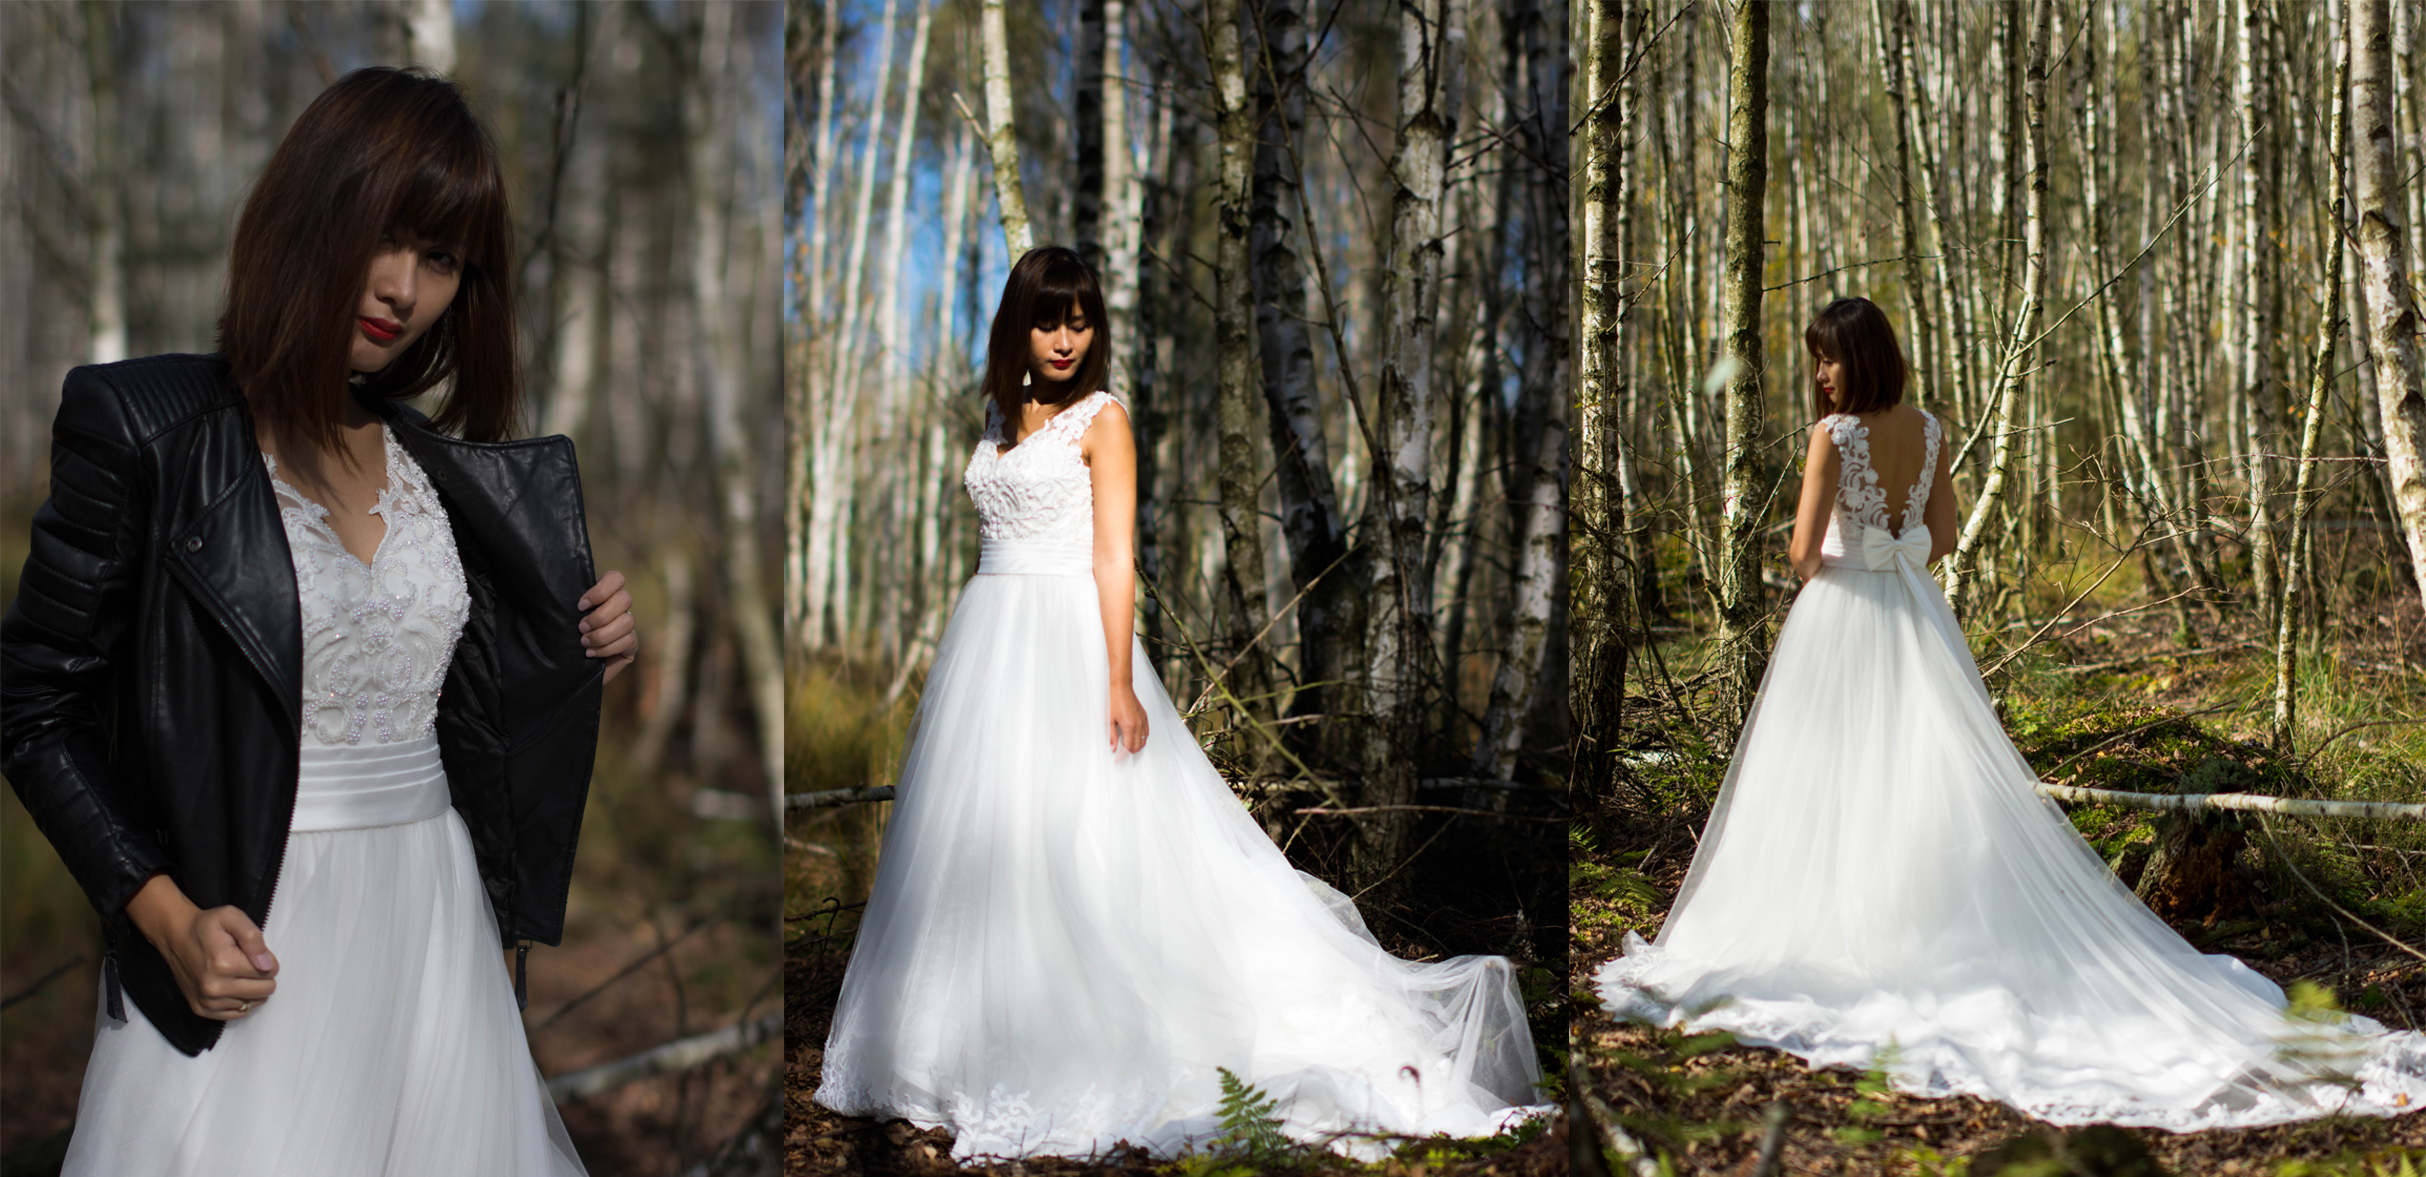 robe de mariée alsace bas rhin haut rhin strasbourg haguenau saverne wissembourg benfeld colmar mulhouse metz nancy lorraine moselle france luxembourg belgique suisse